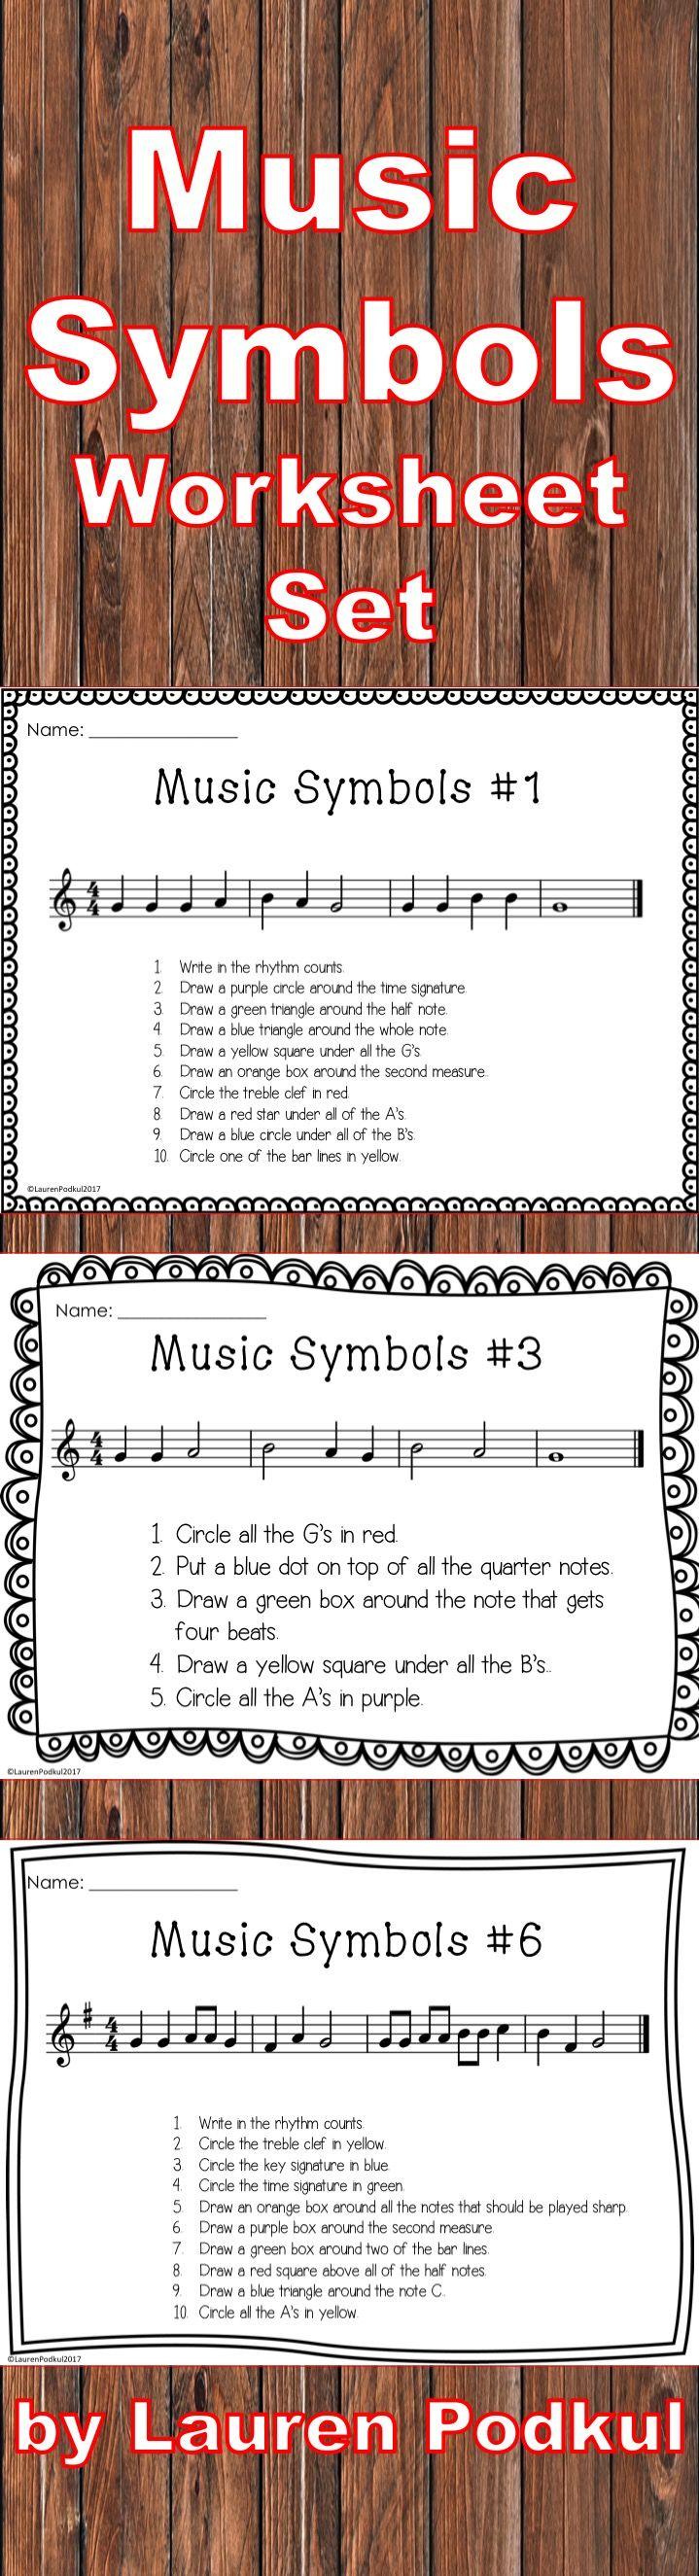 Music Symbols Worksheets Pinterest Music Symbols Symbols And